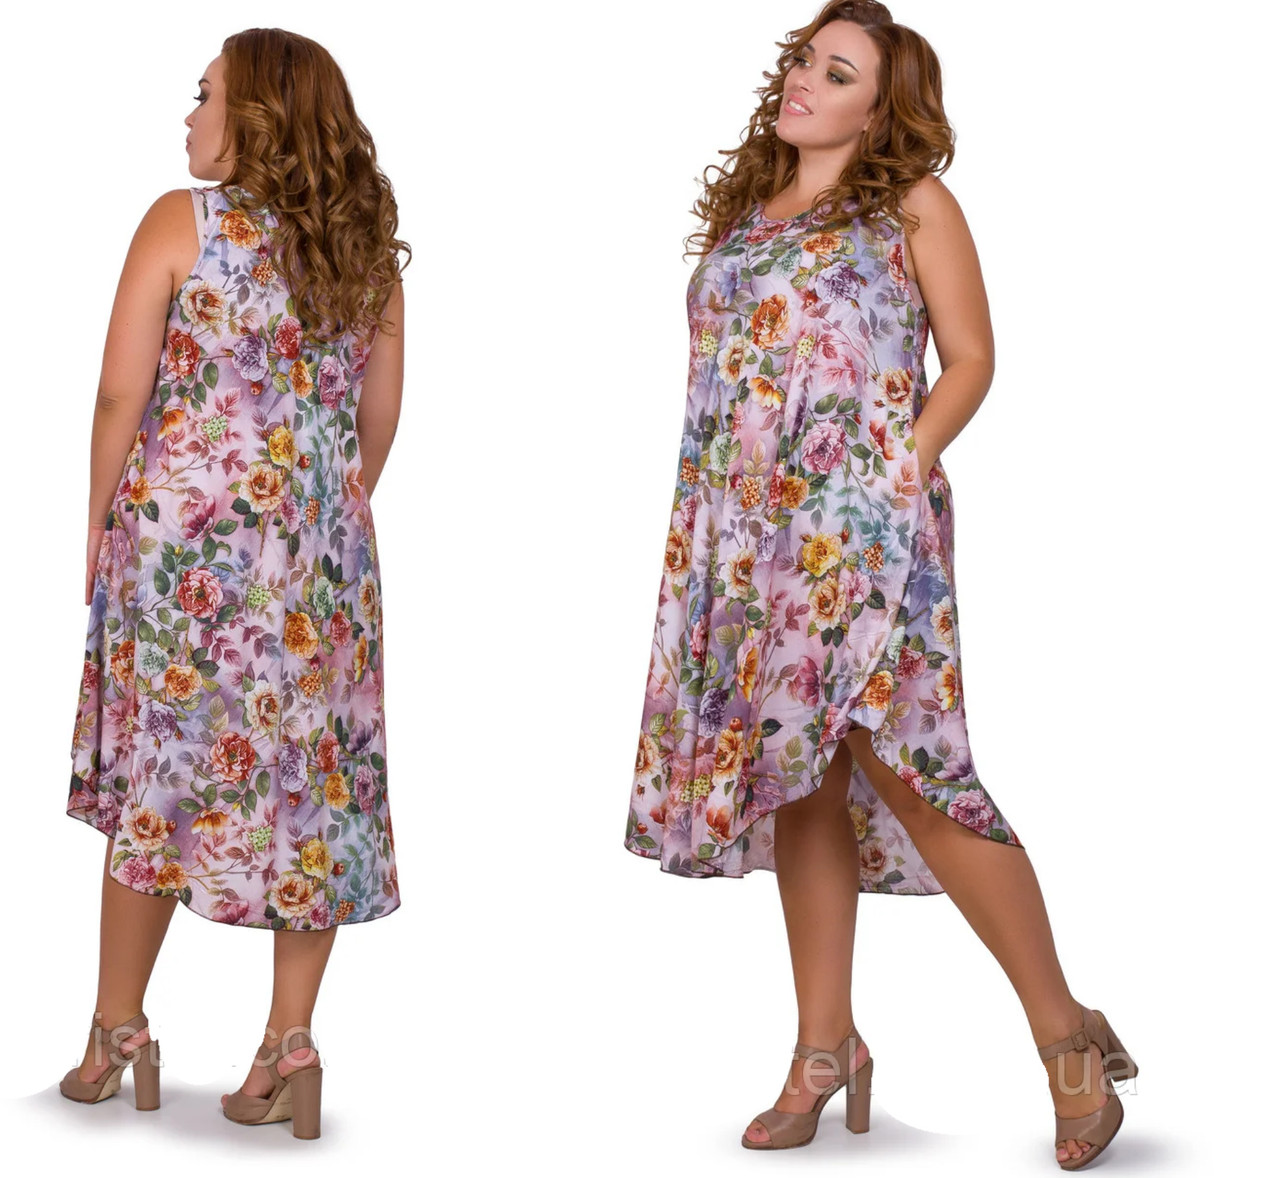 Красивый женский сарафан летний размеры 52-56